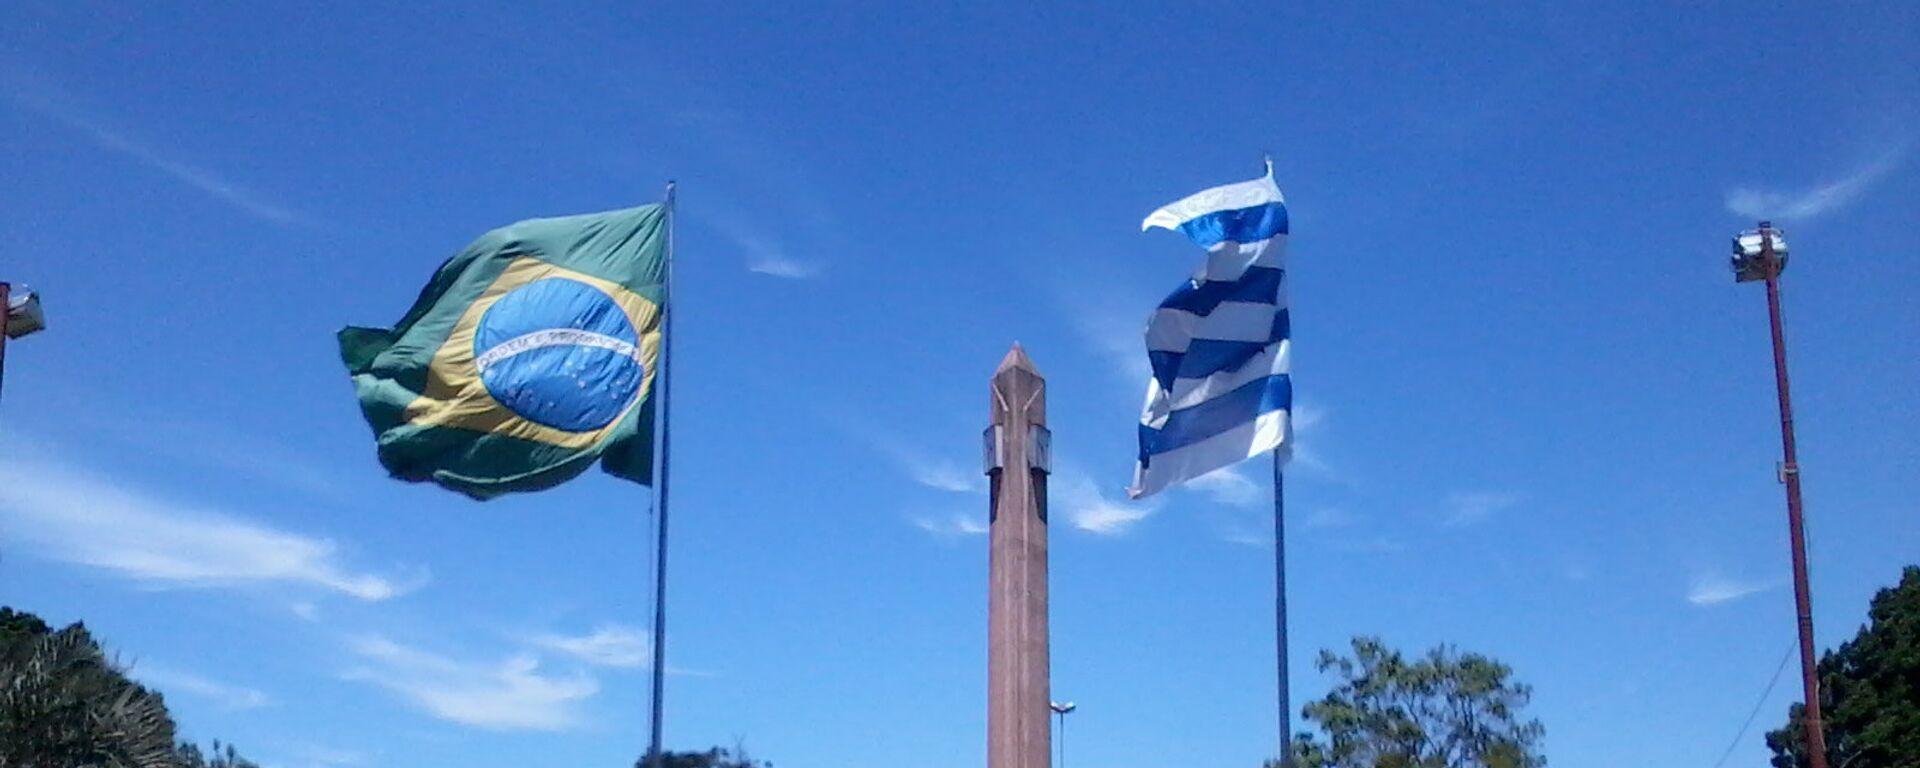 Frontera de la Paz entre Uruguay y Brasil, plaza internacional de Rivera-Santana do Livramento. - Sputnik Mundo, 1920, 22.06.2021